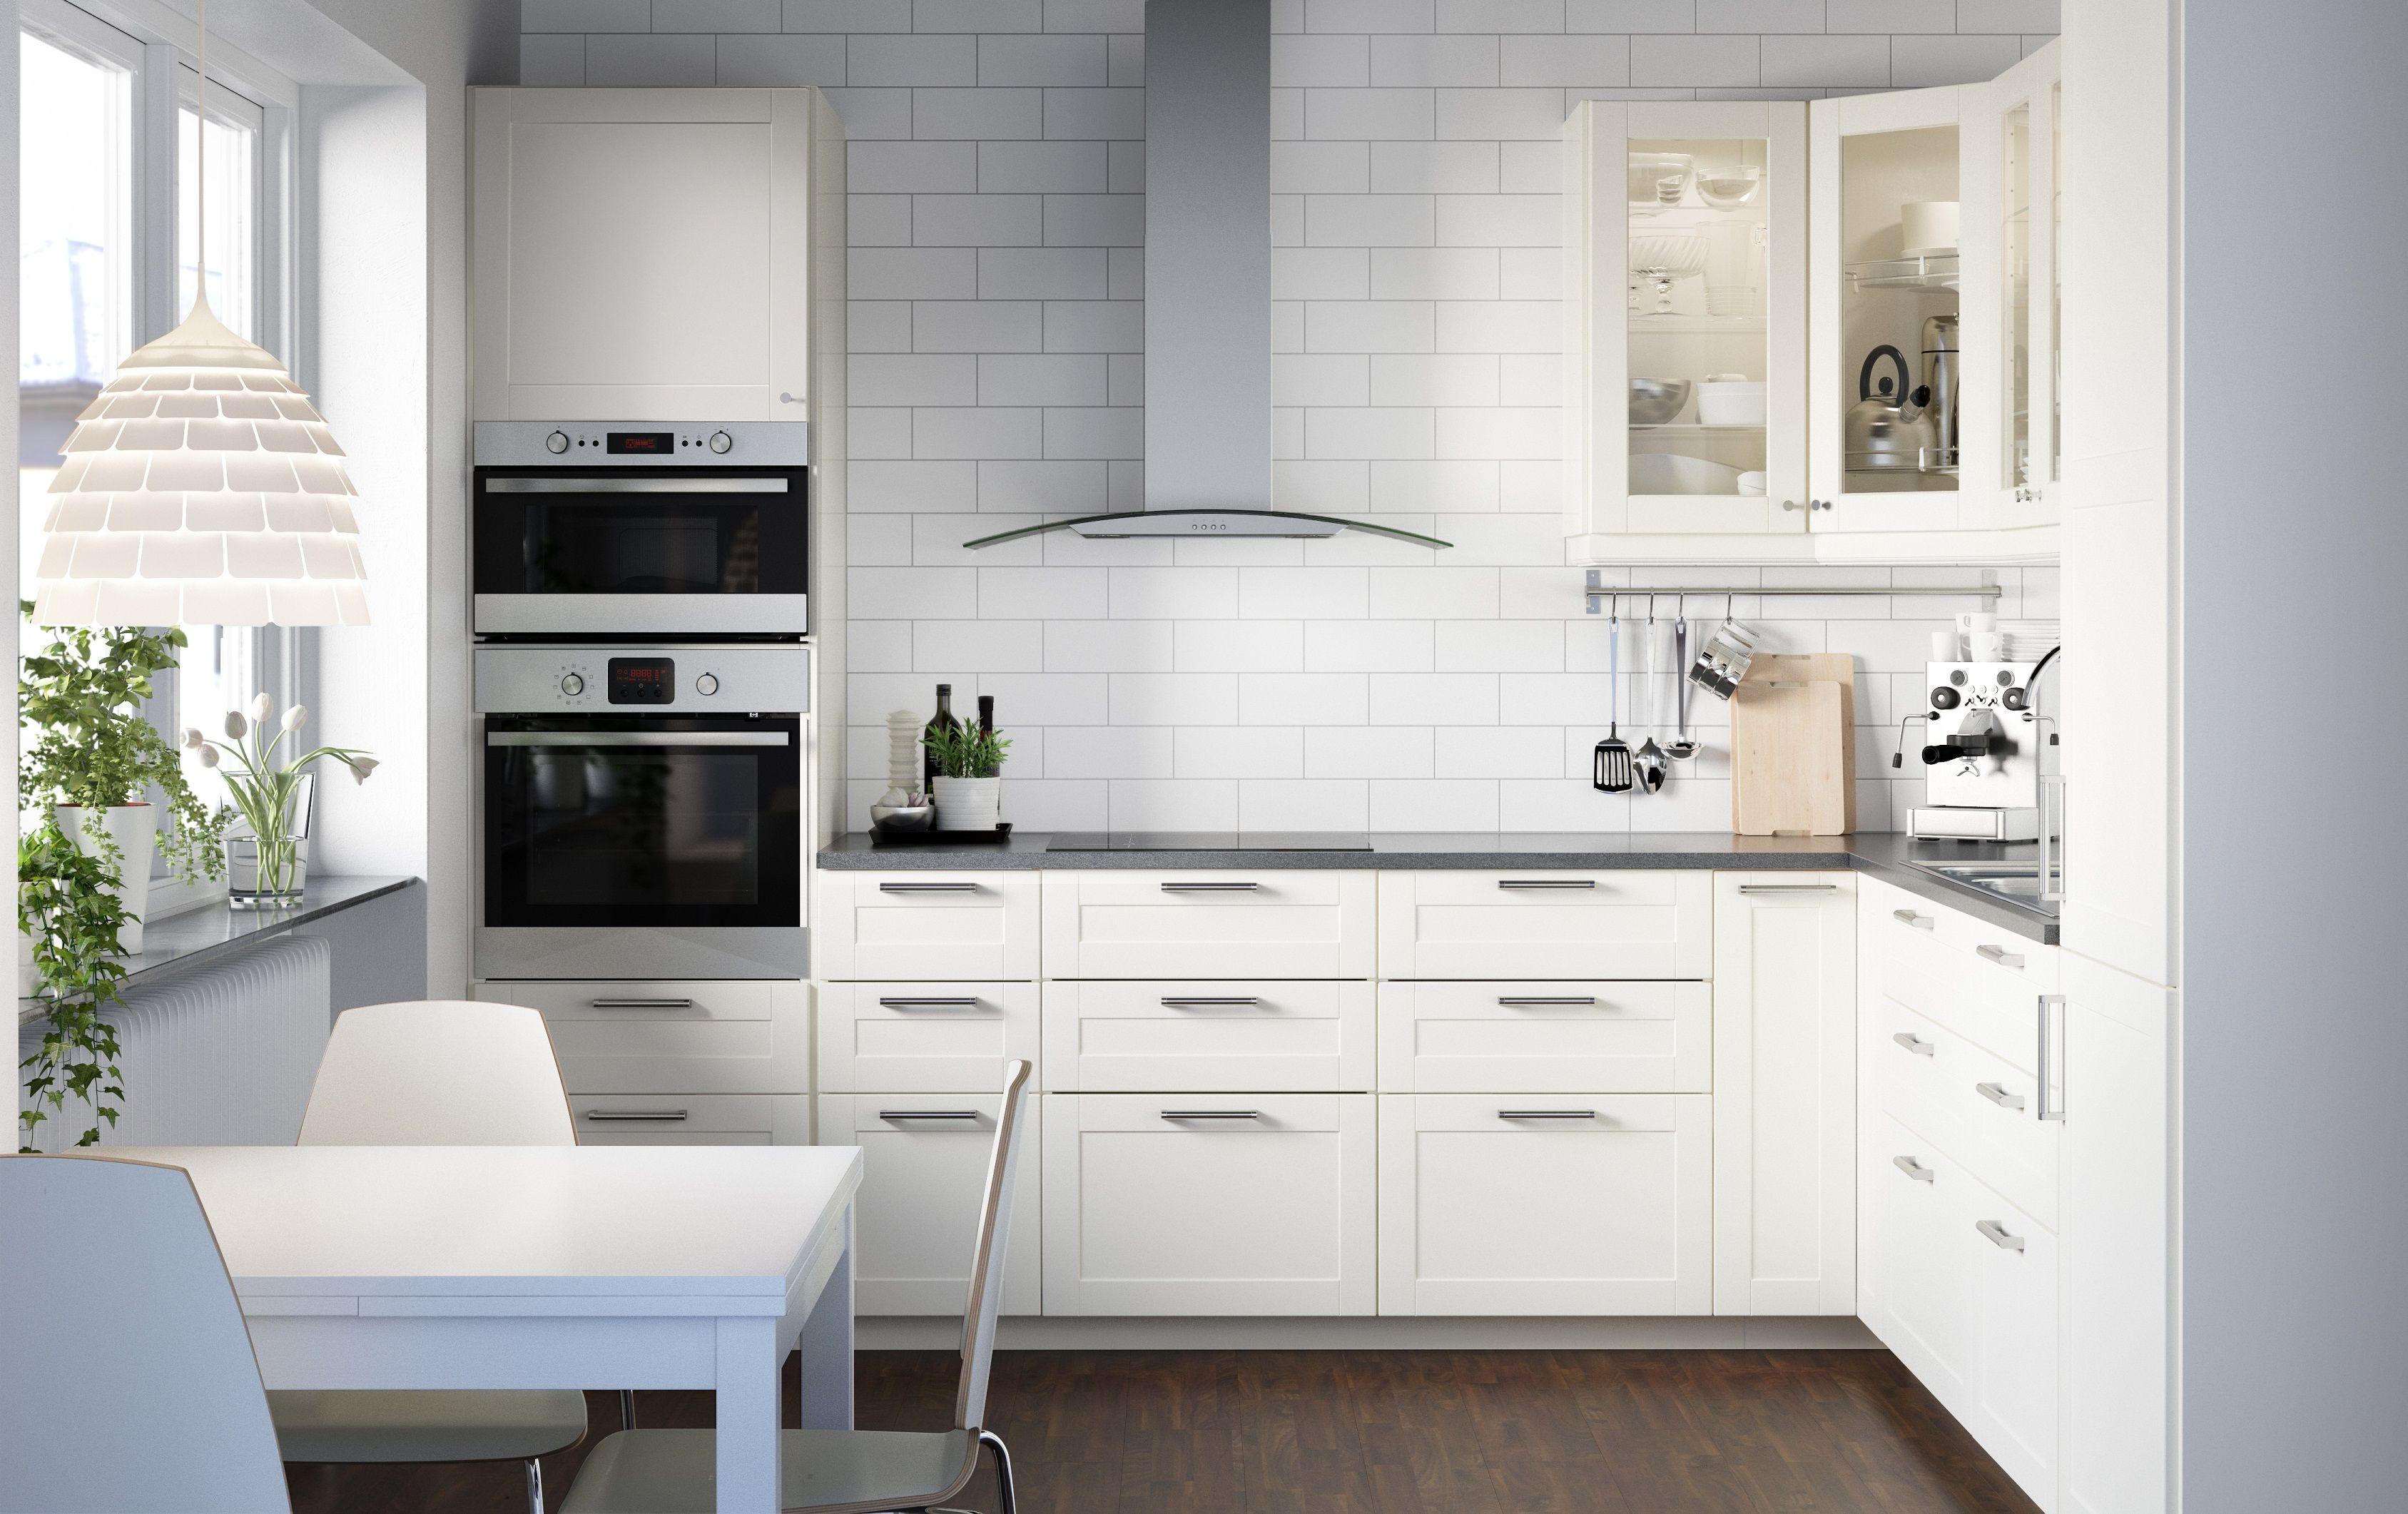 Metod Keuken Ikea : Metod keuken #ikea #ikeanl #wit #ruimte #modern #inspiratie